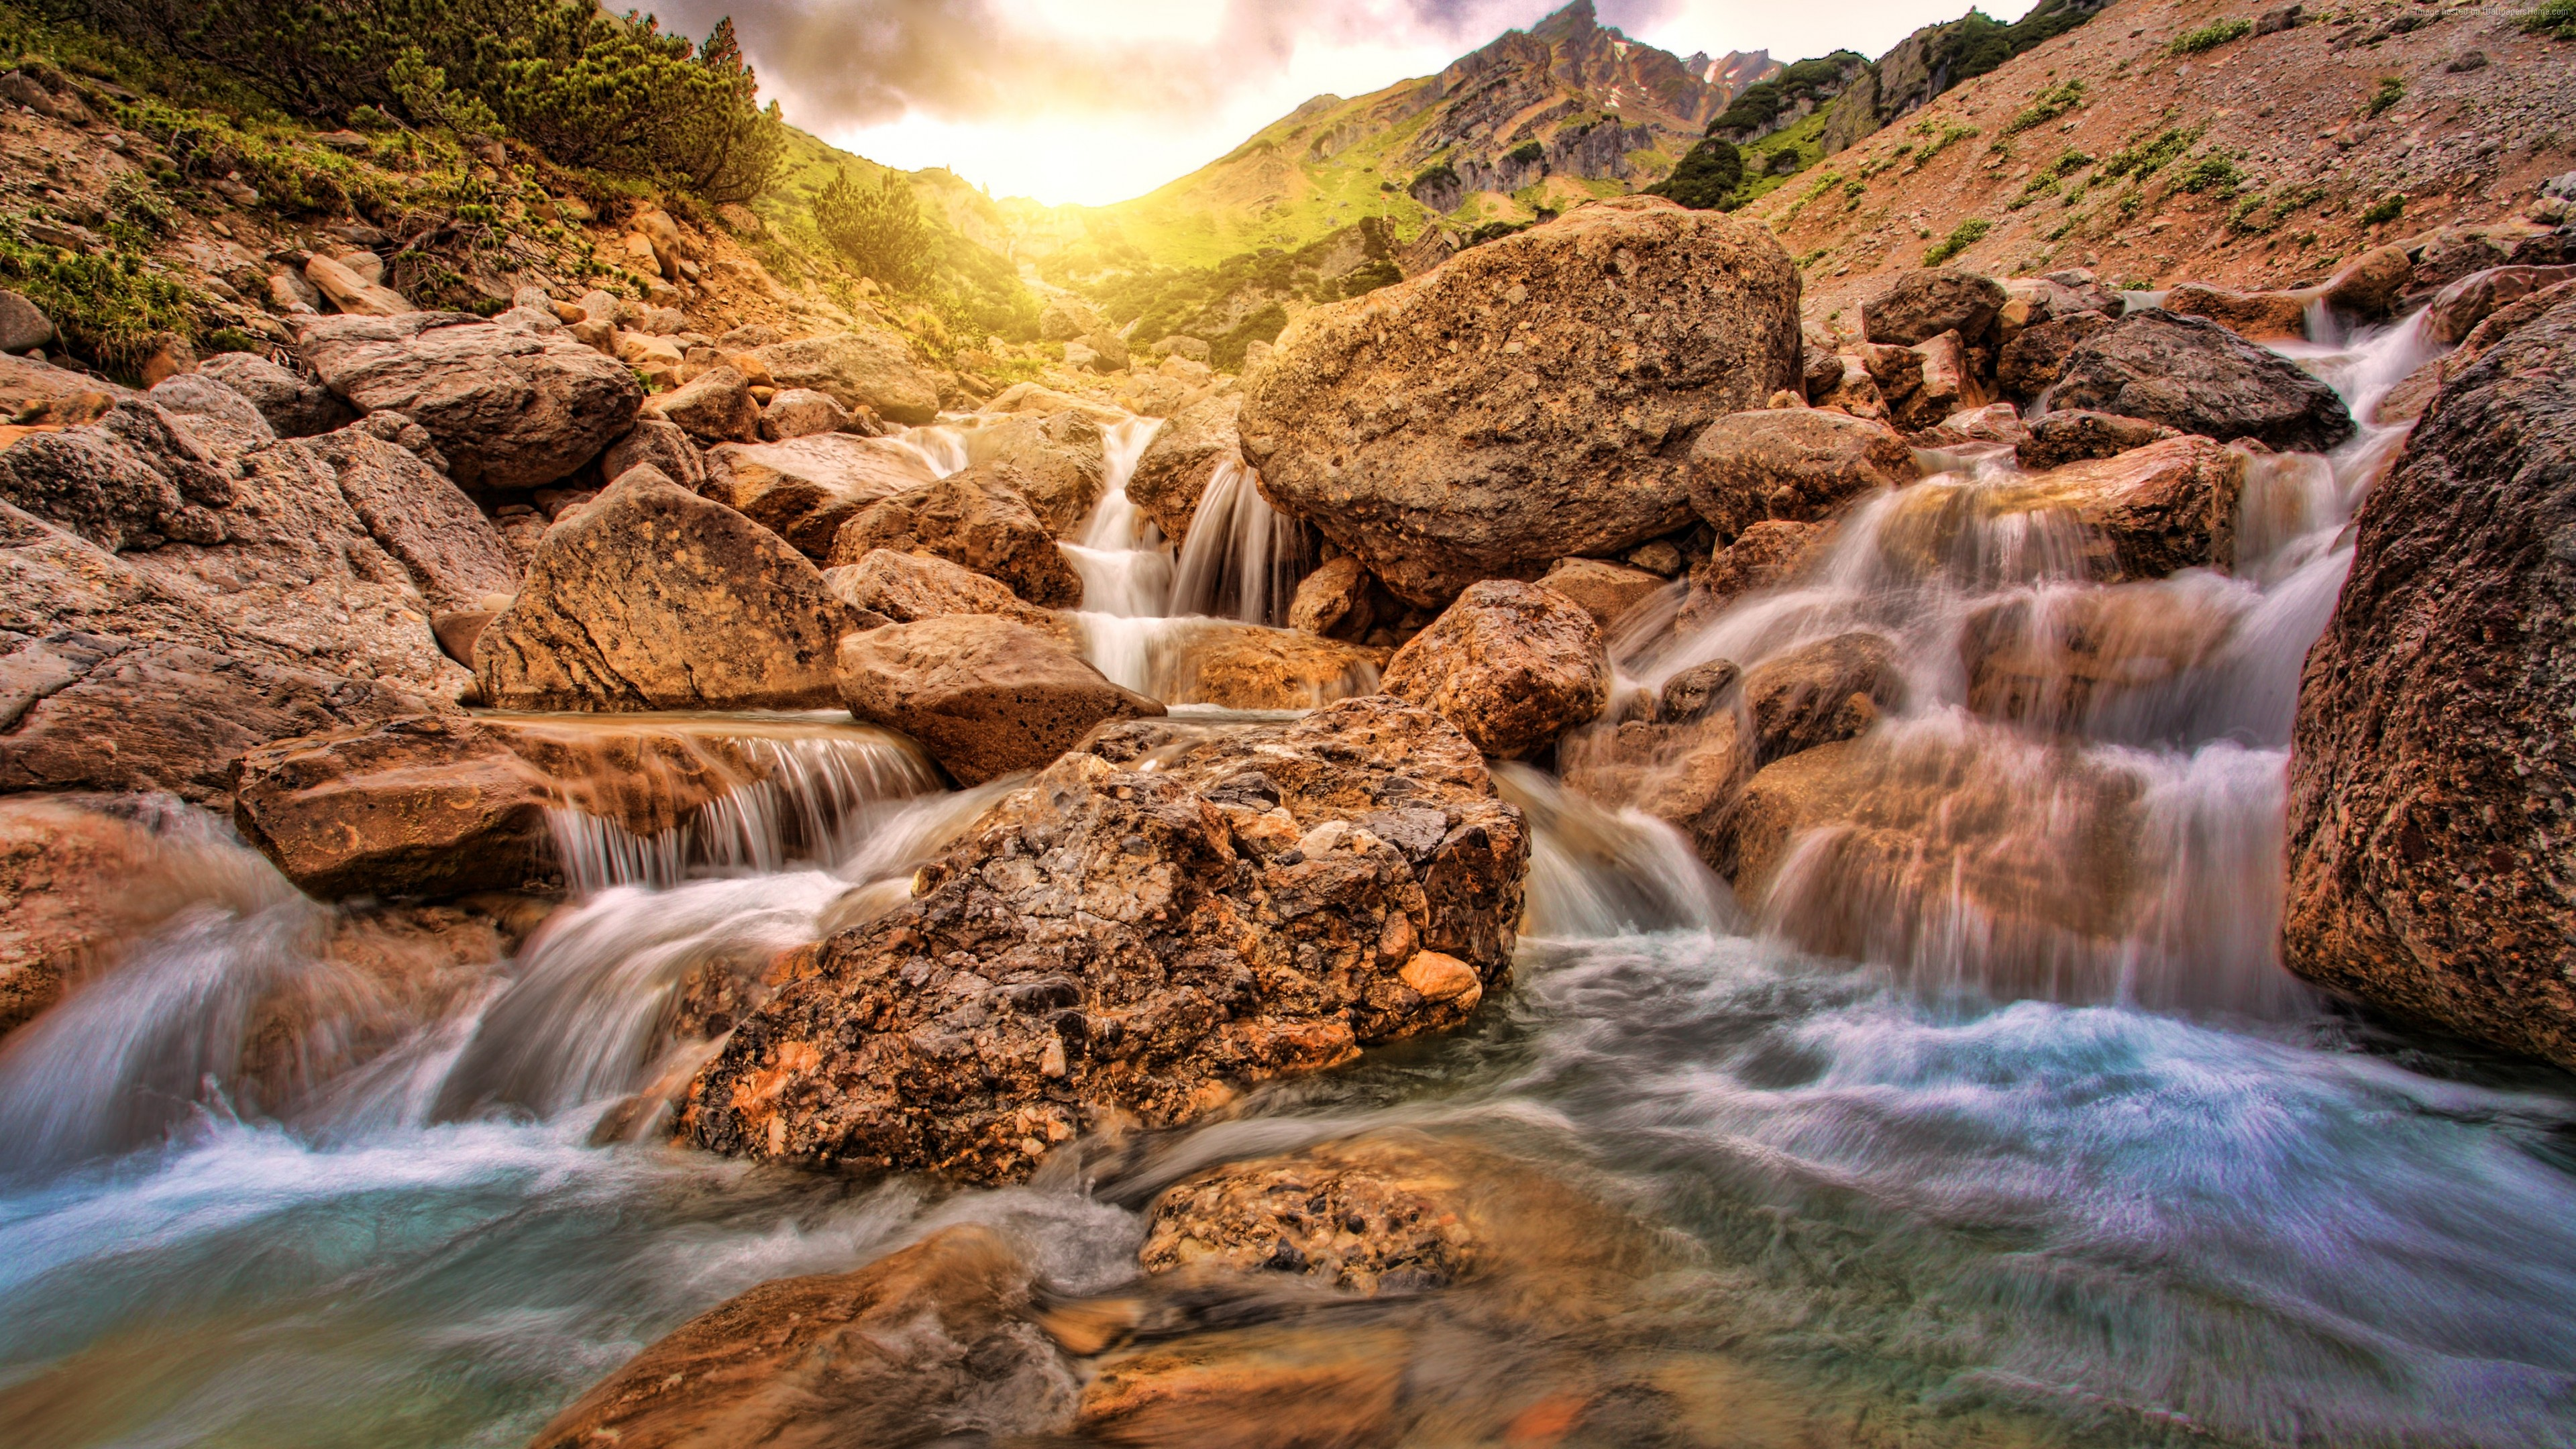 Wallpaper Waterfall Alpine 4k Nature Wallpaper Download High Resolution 4k Wallpaper